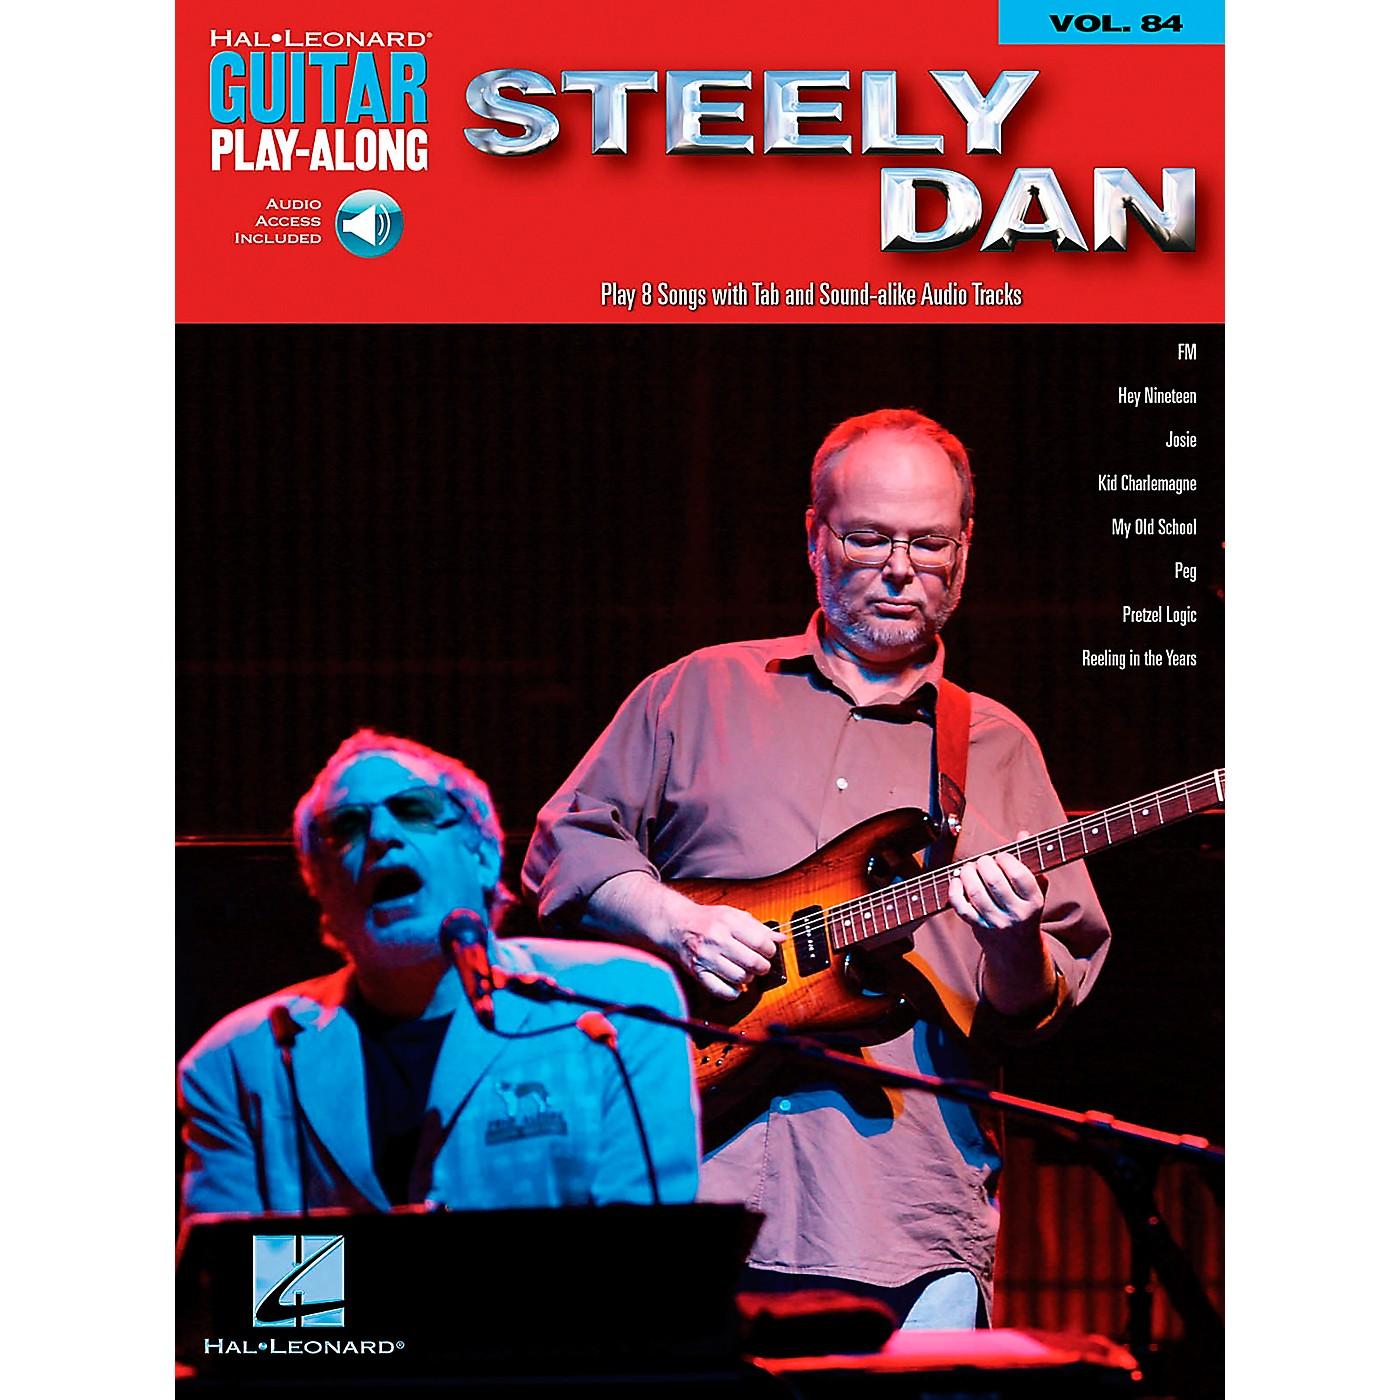 Hal Leonard Steely Dan - Guitar Play-Along Volume 84 (Book/CD) thumbnail